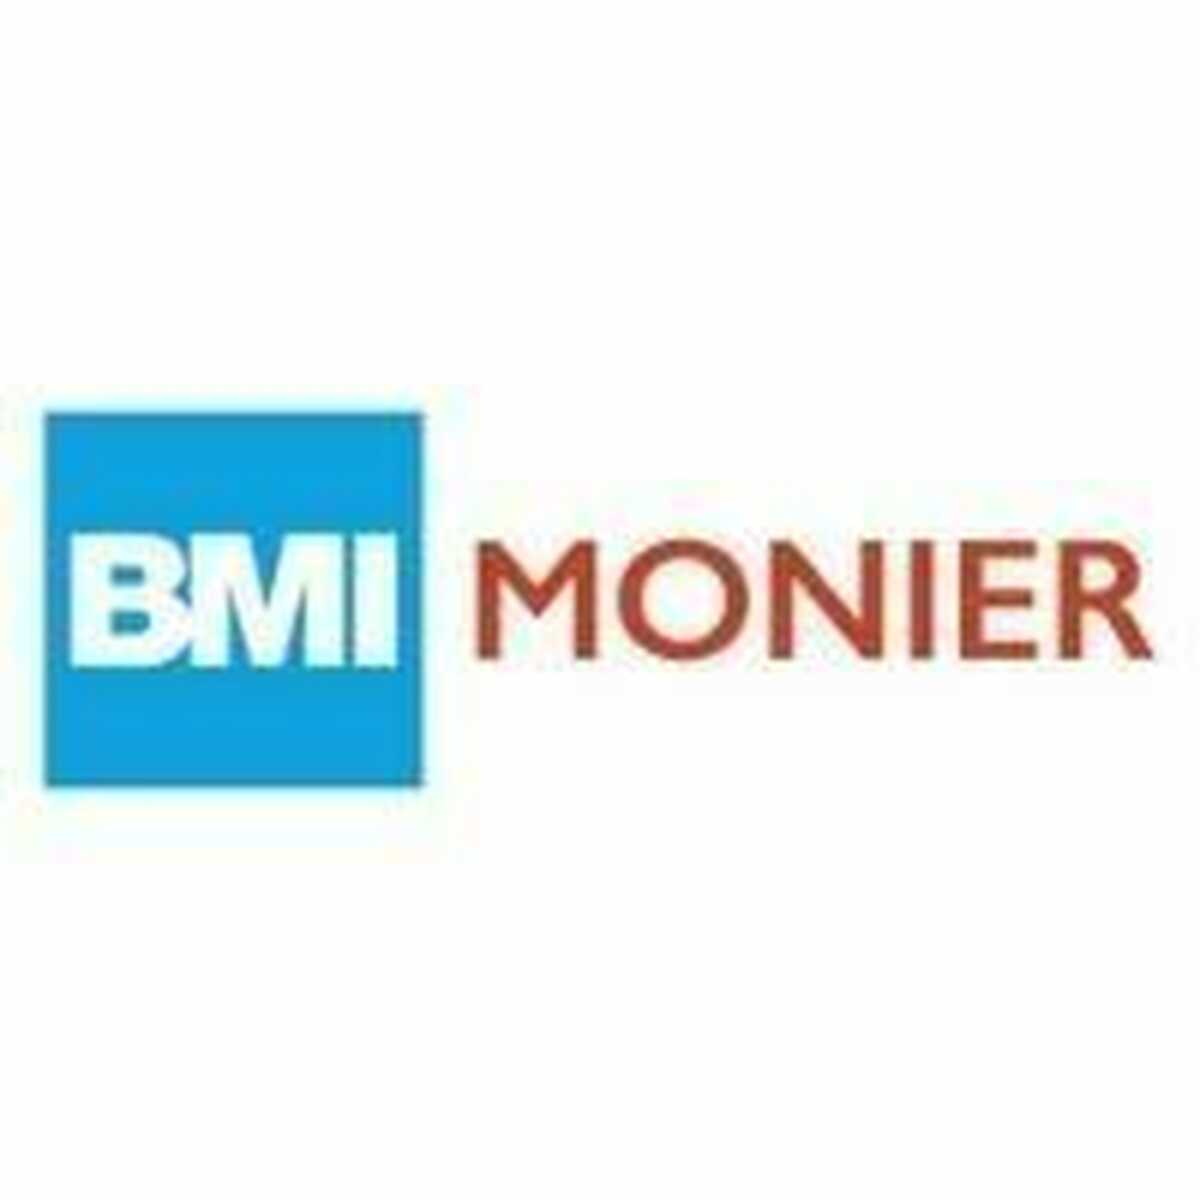 BMI Monier